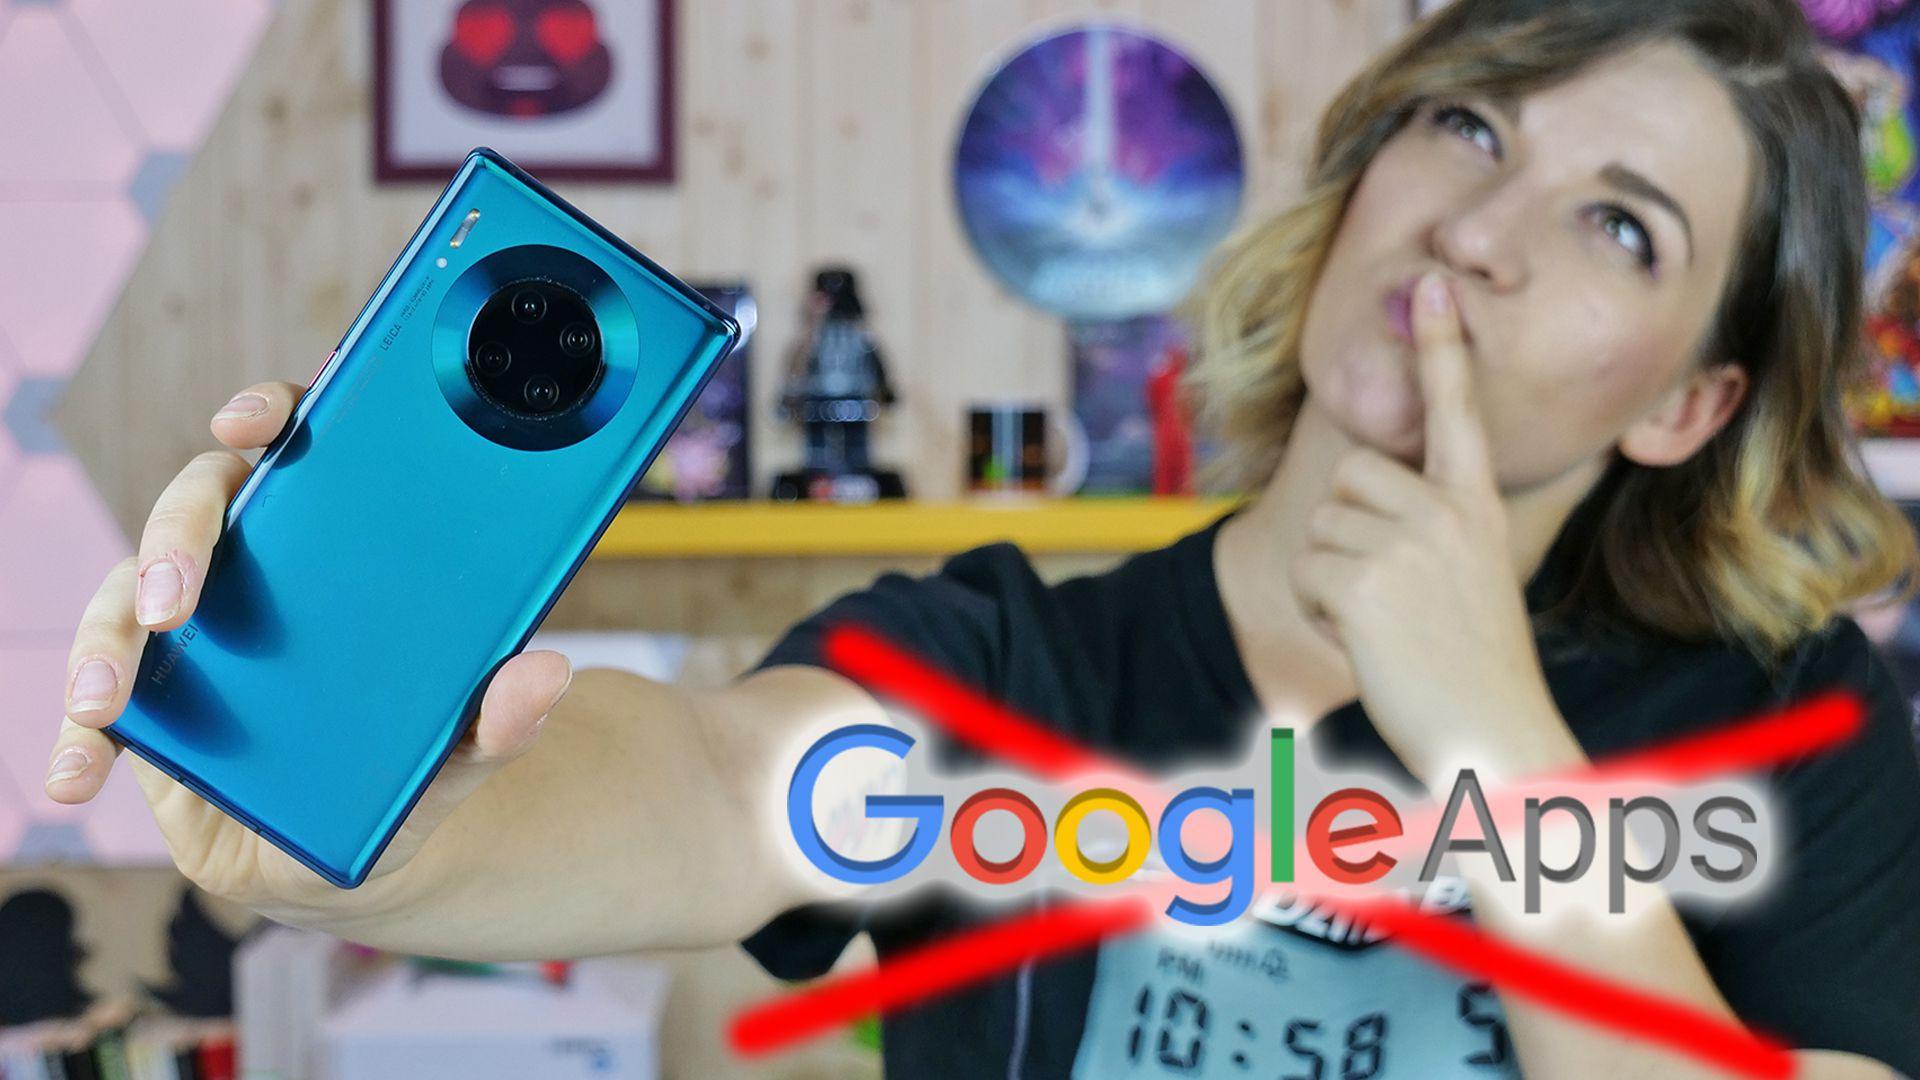 Huawei Mate 30 Pro: è possibile vivere senza Google Apps? thumbnail